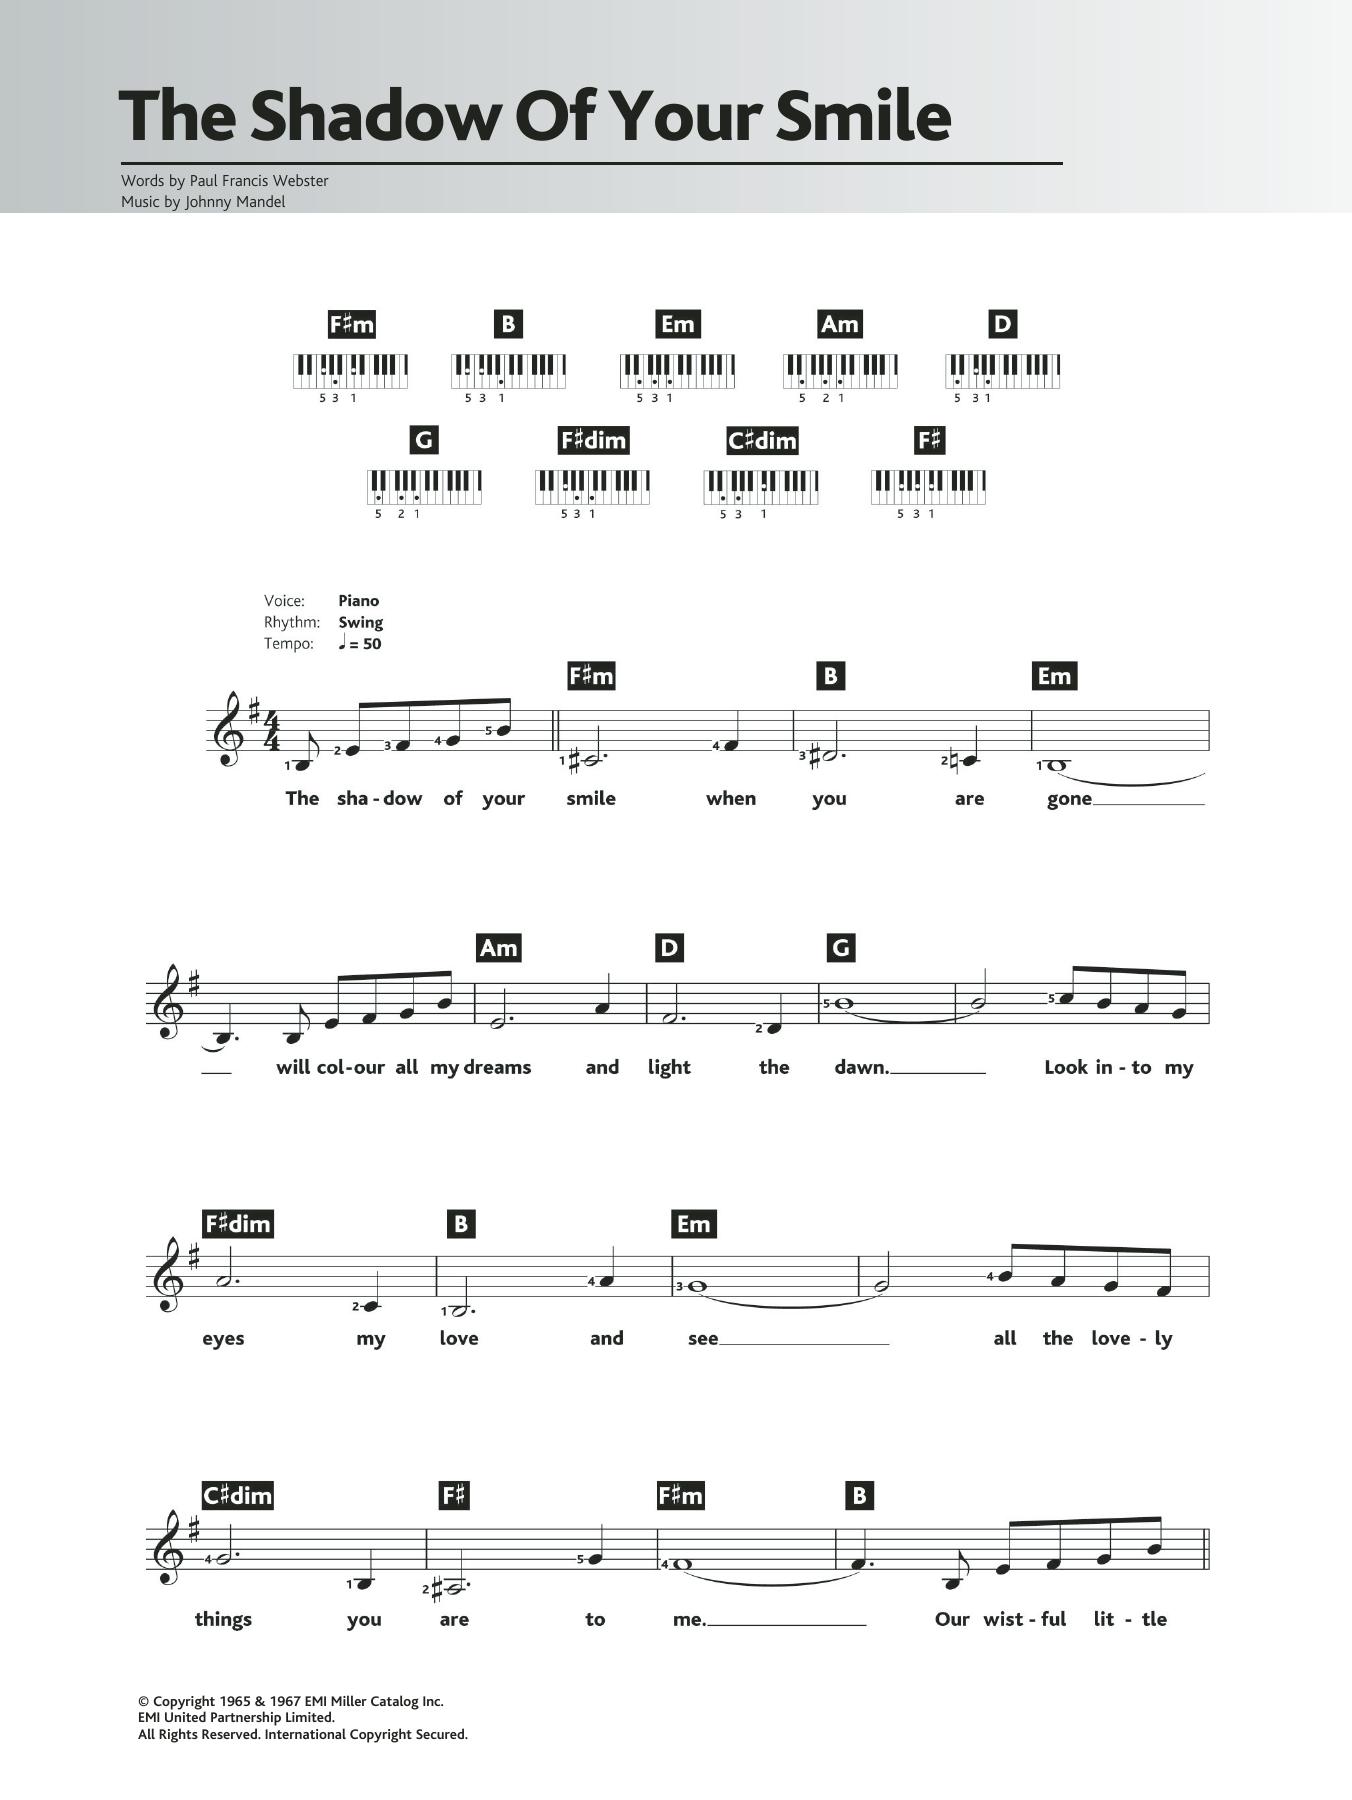 Sheet Music Digital Files To Print Licensed Paul Francis Webster